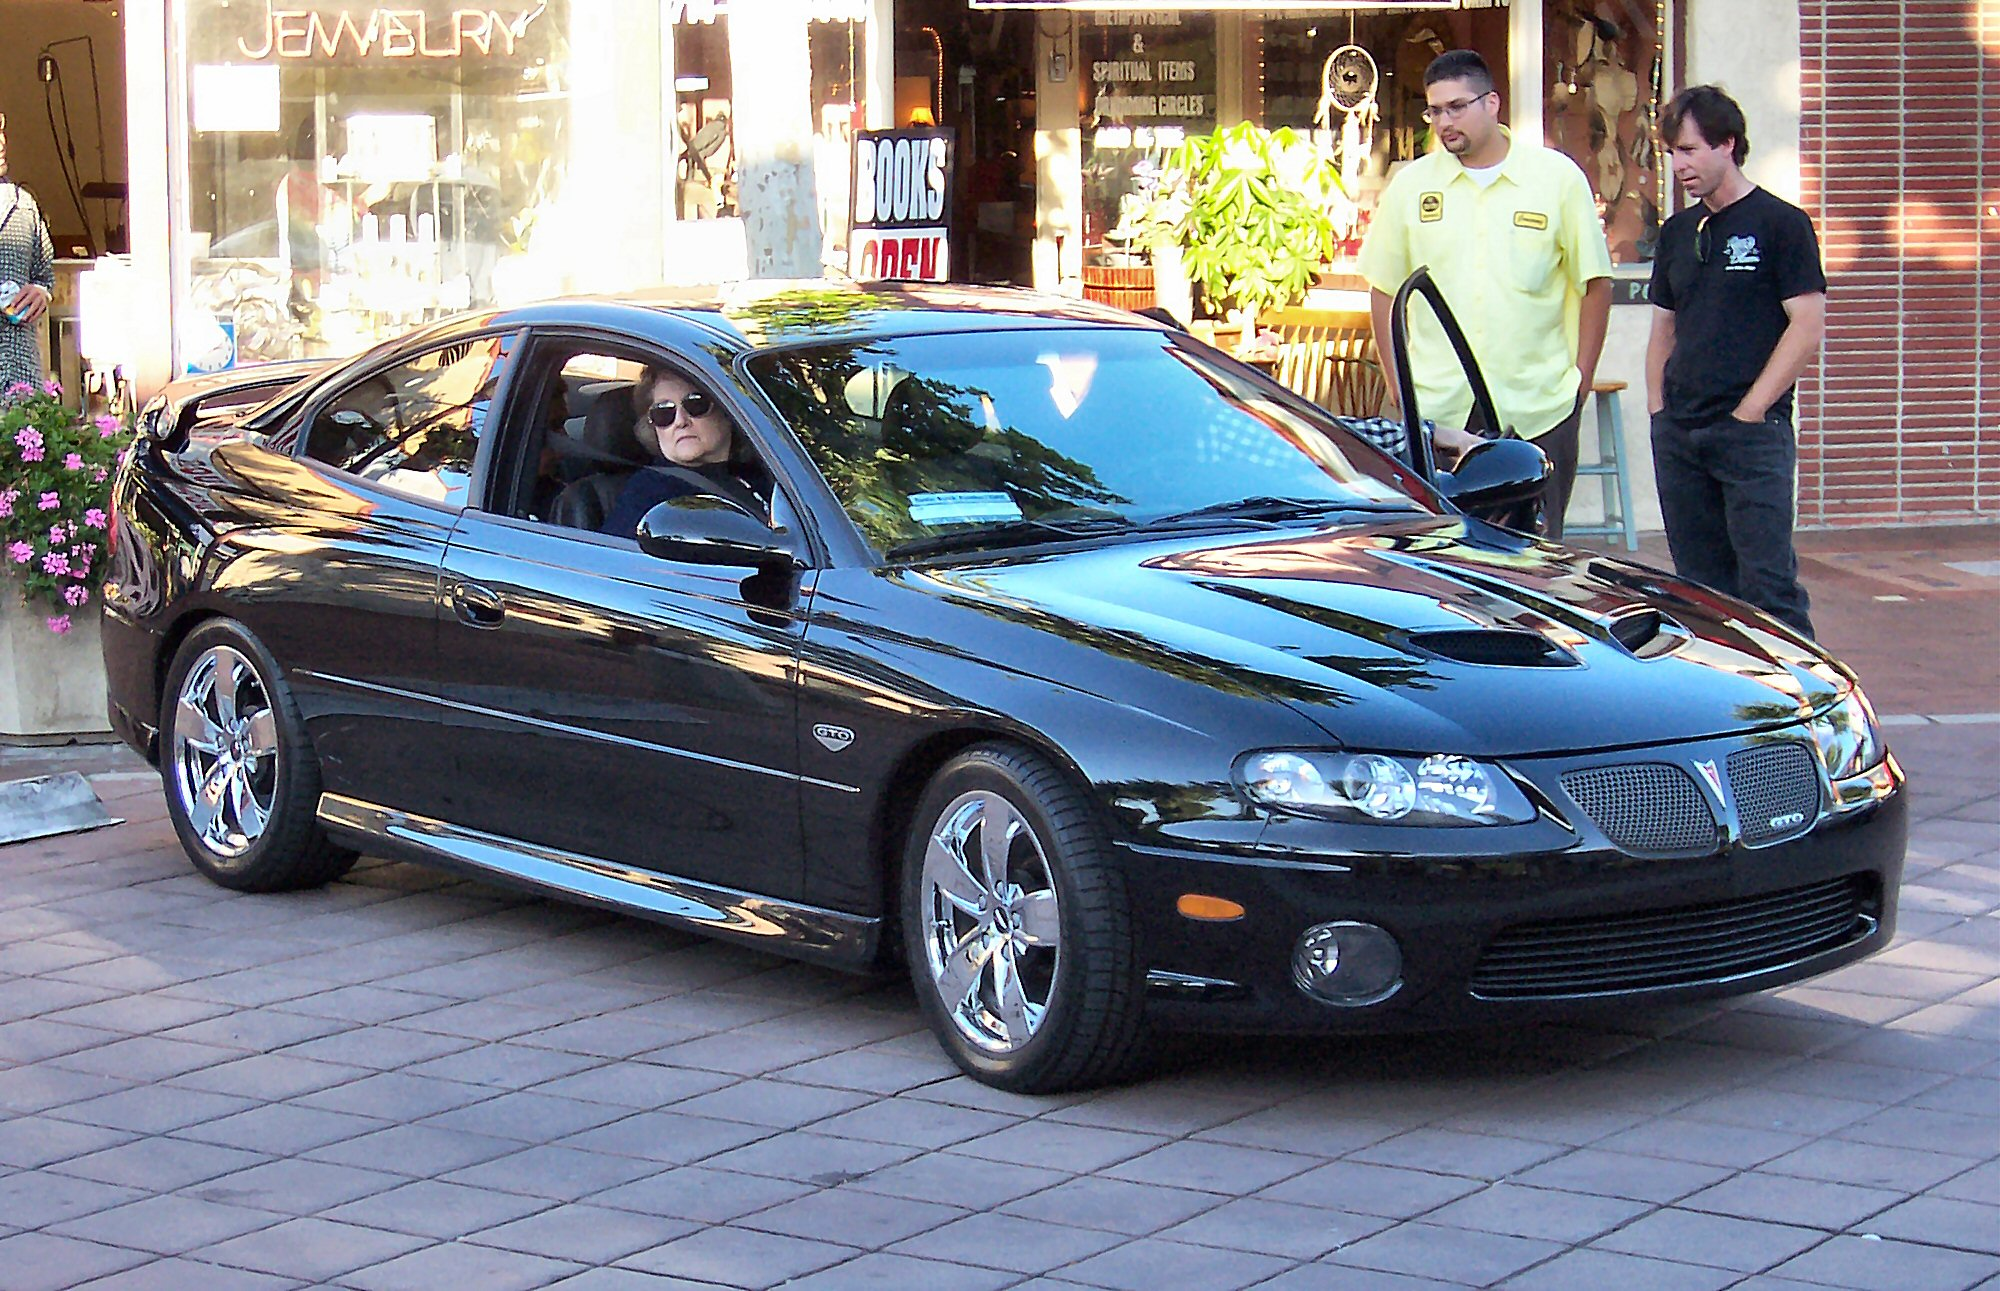 https://i2.wp.com/upload.wikimedia.org/wikipedia/commons/c/c4/2005_Pontiac_GTO.jpg